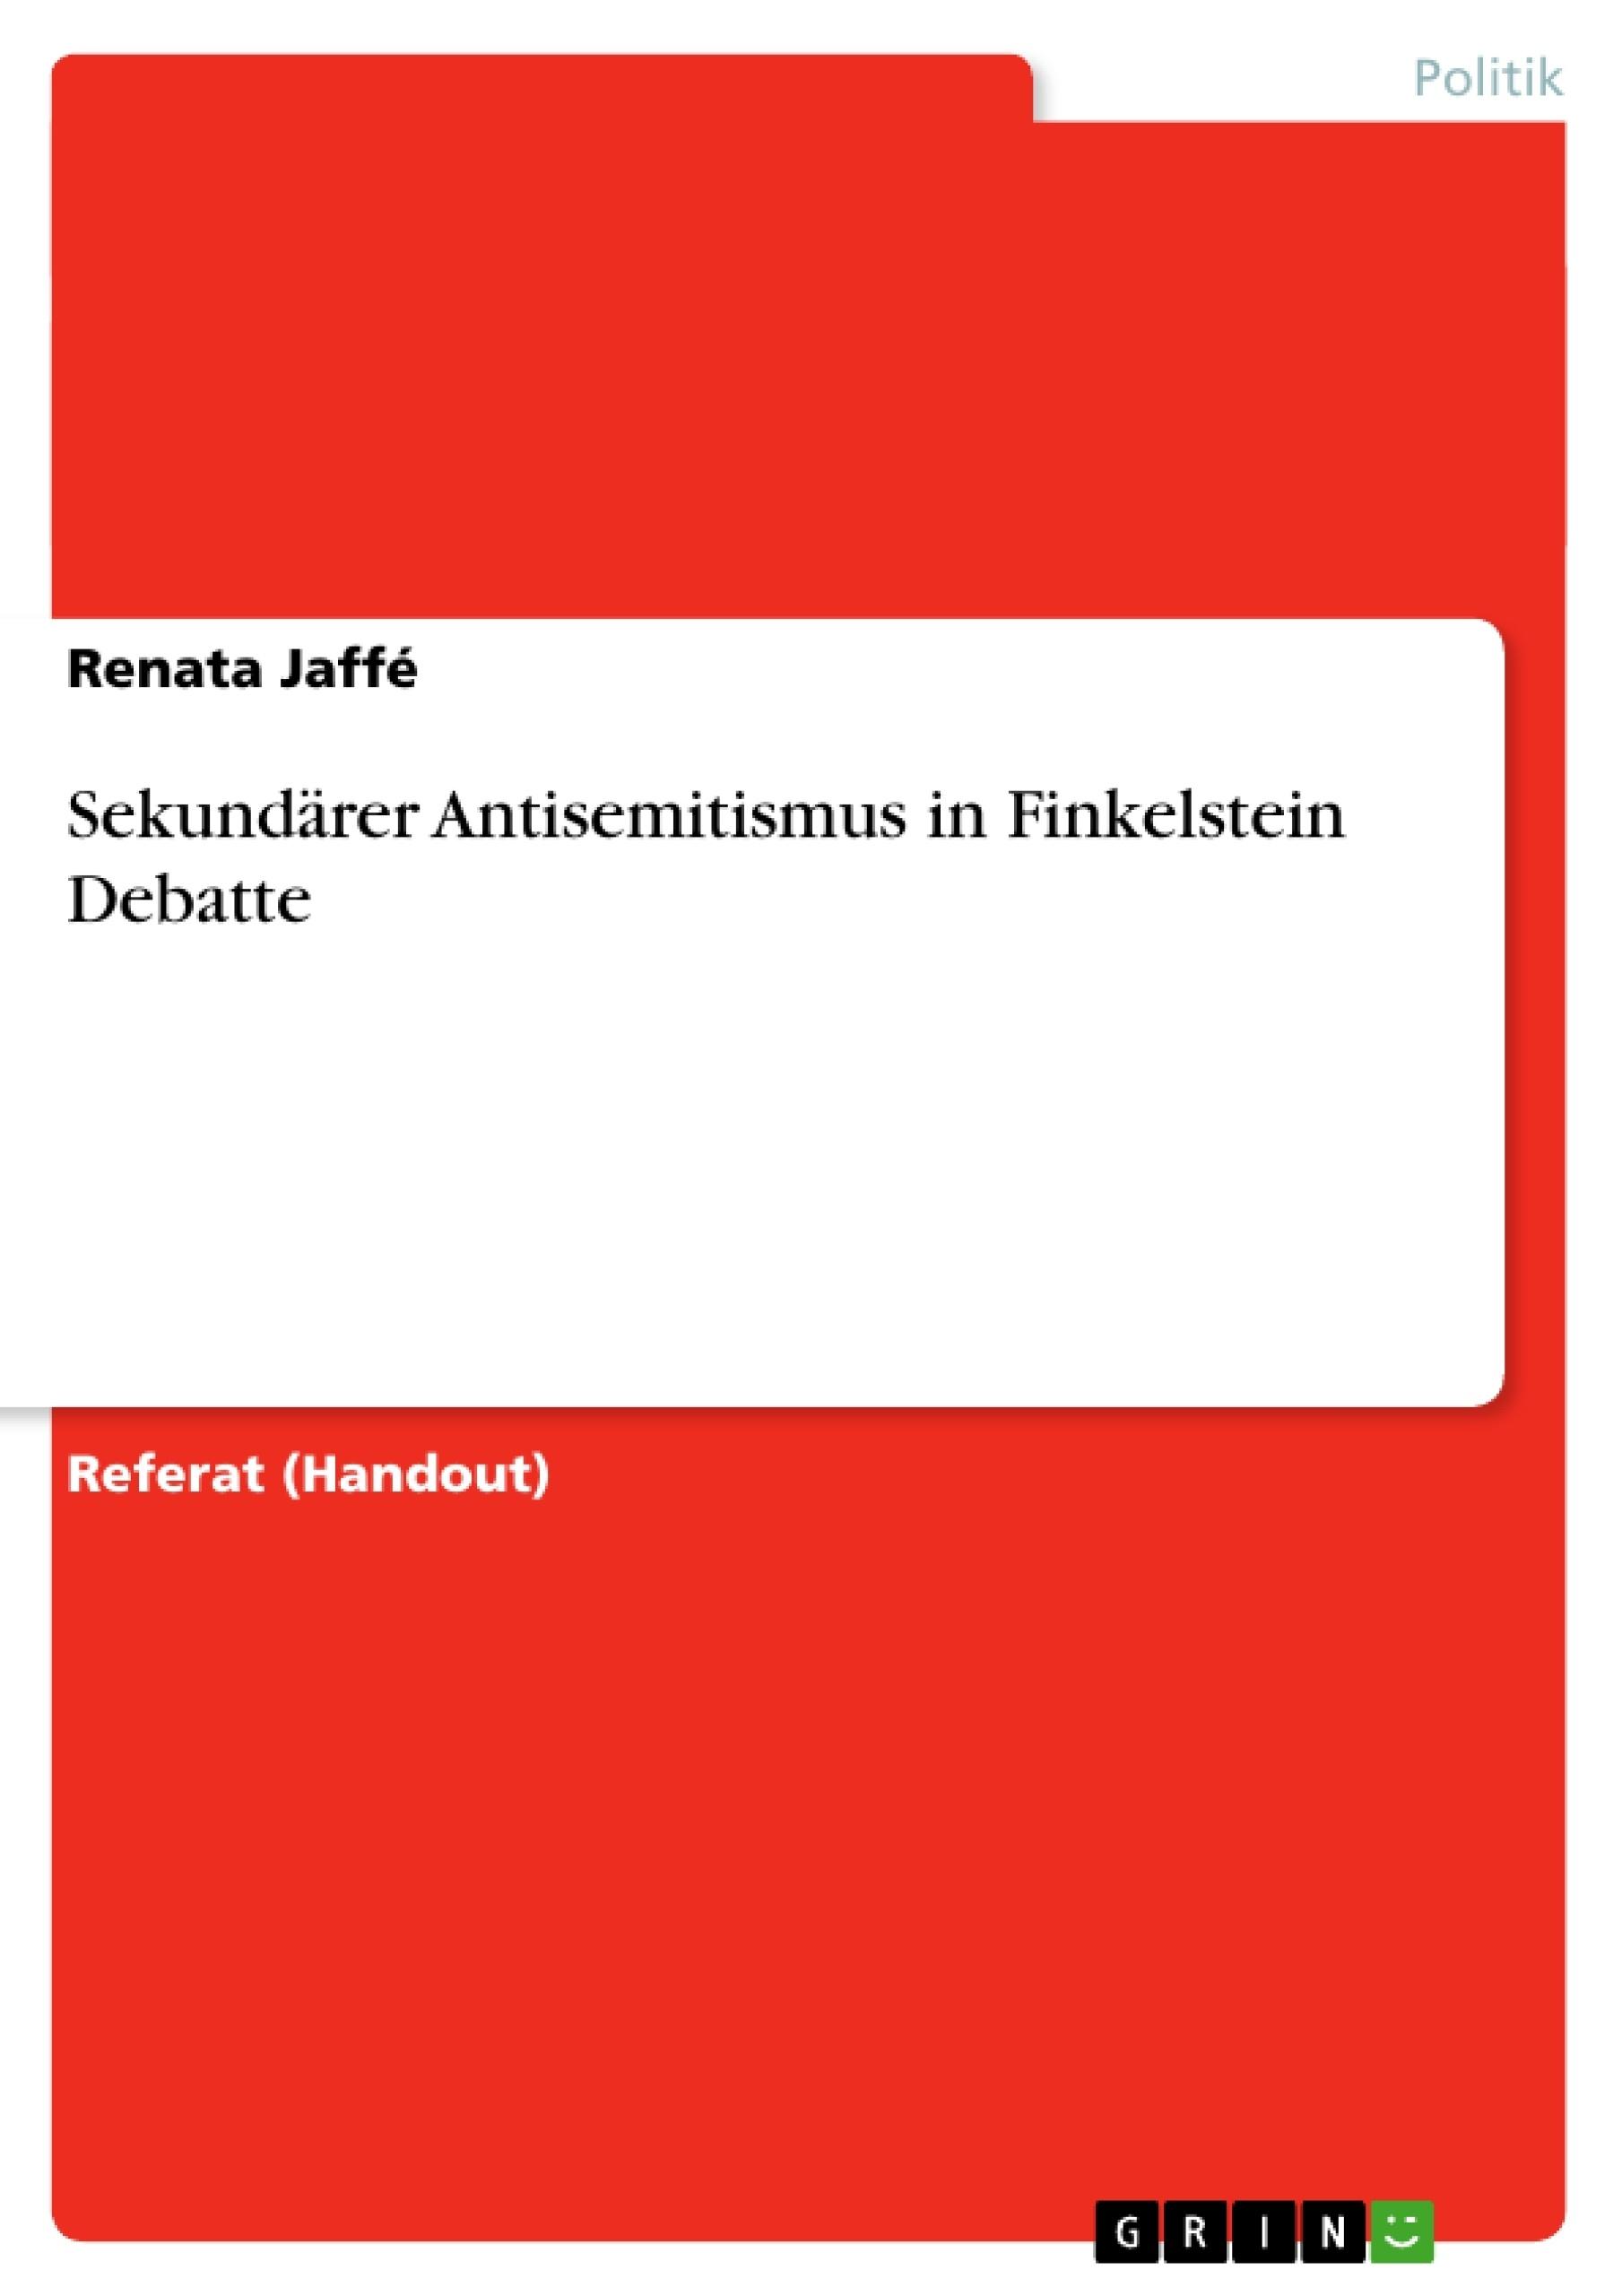 Titel: Sekundärer Antisemitismus in Finkelstein Debatte